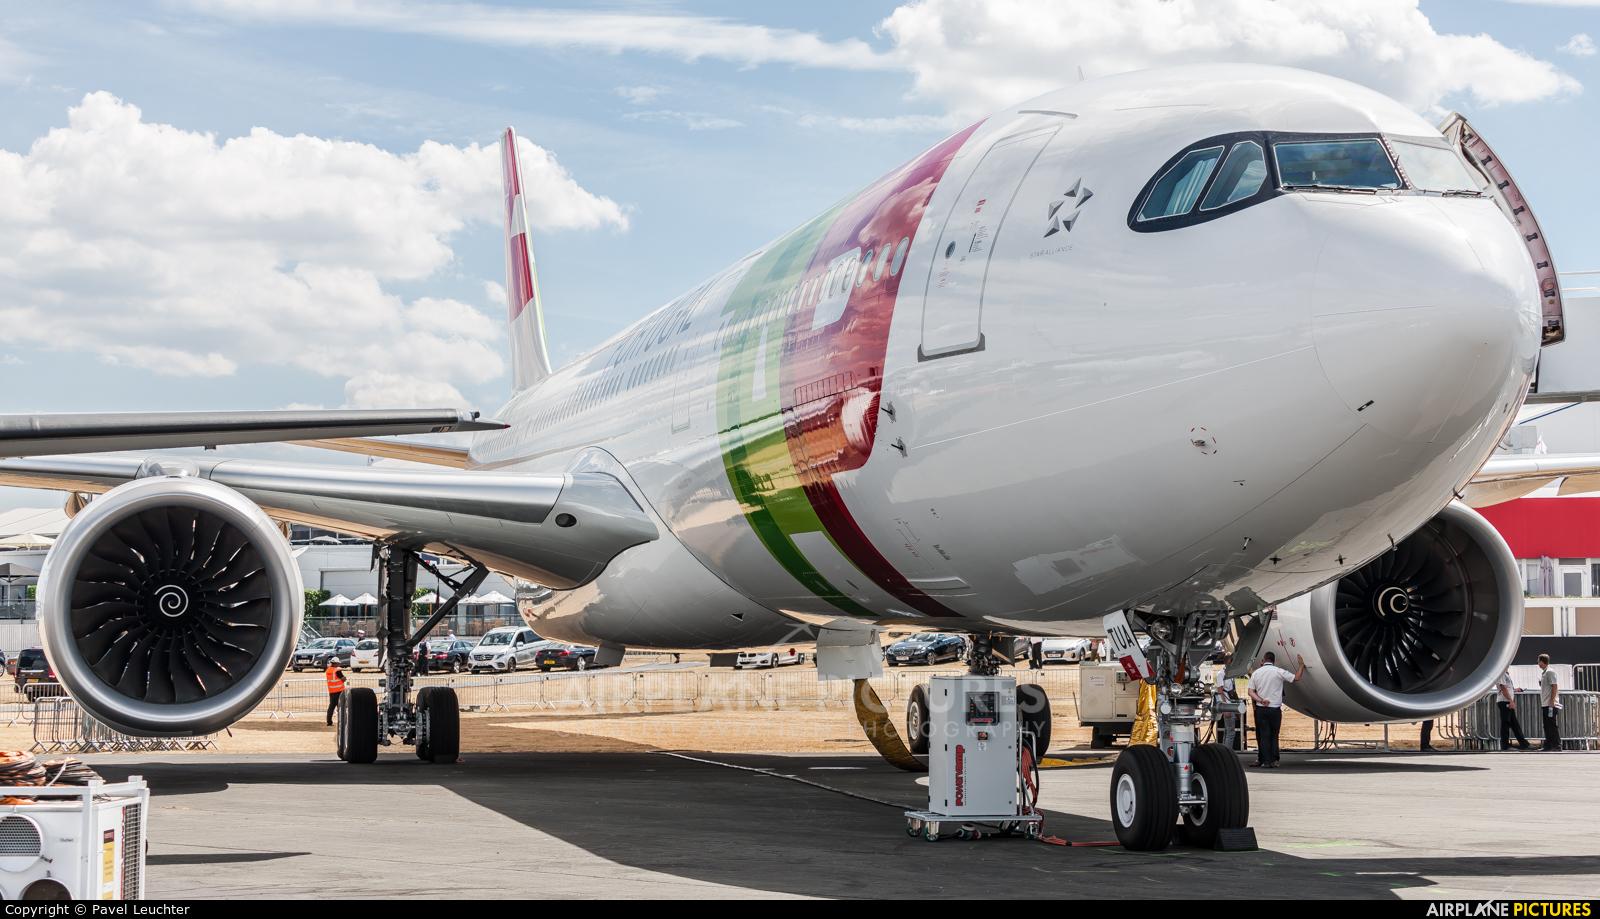 TAP Portugal CS-TUA aircraft at Farnborough